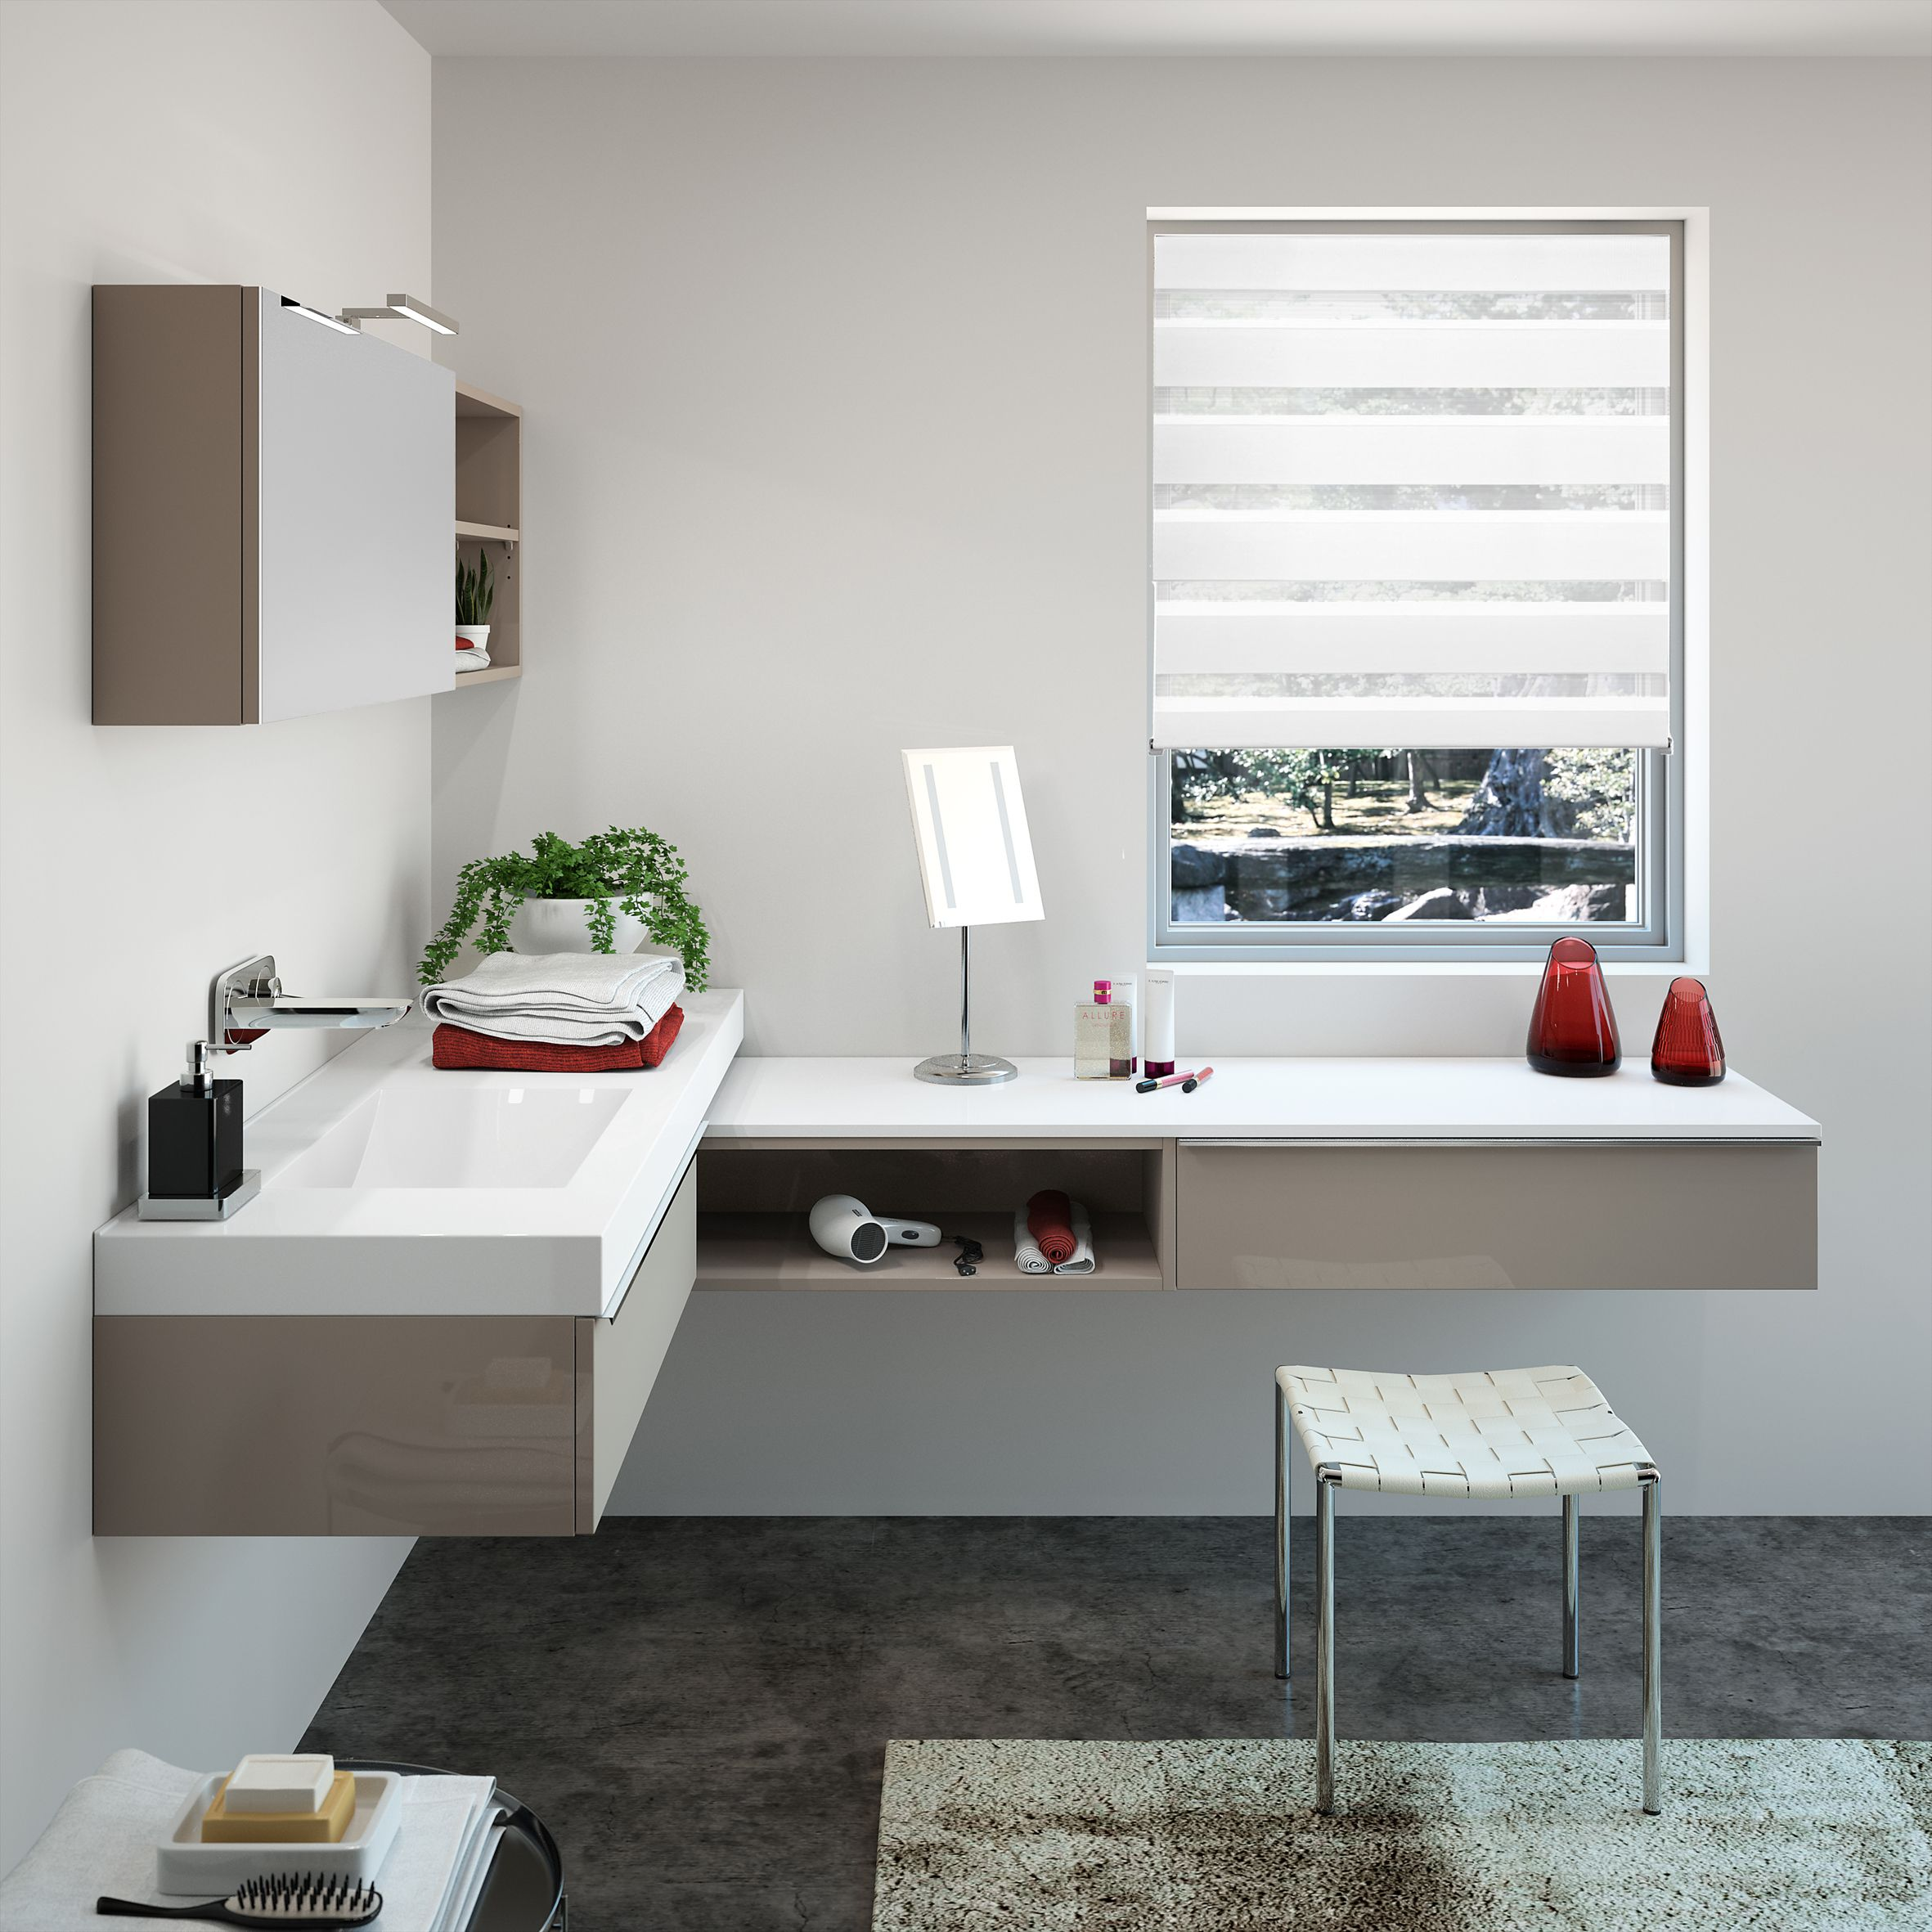 37++ Idee coiffeuse salle de bain ideas in 2021